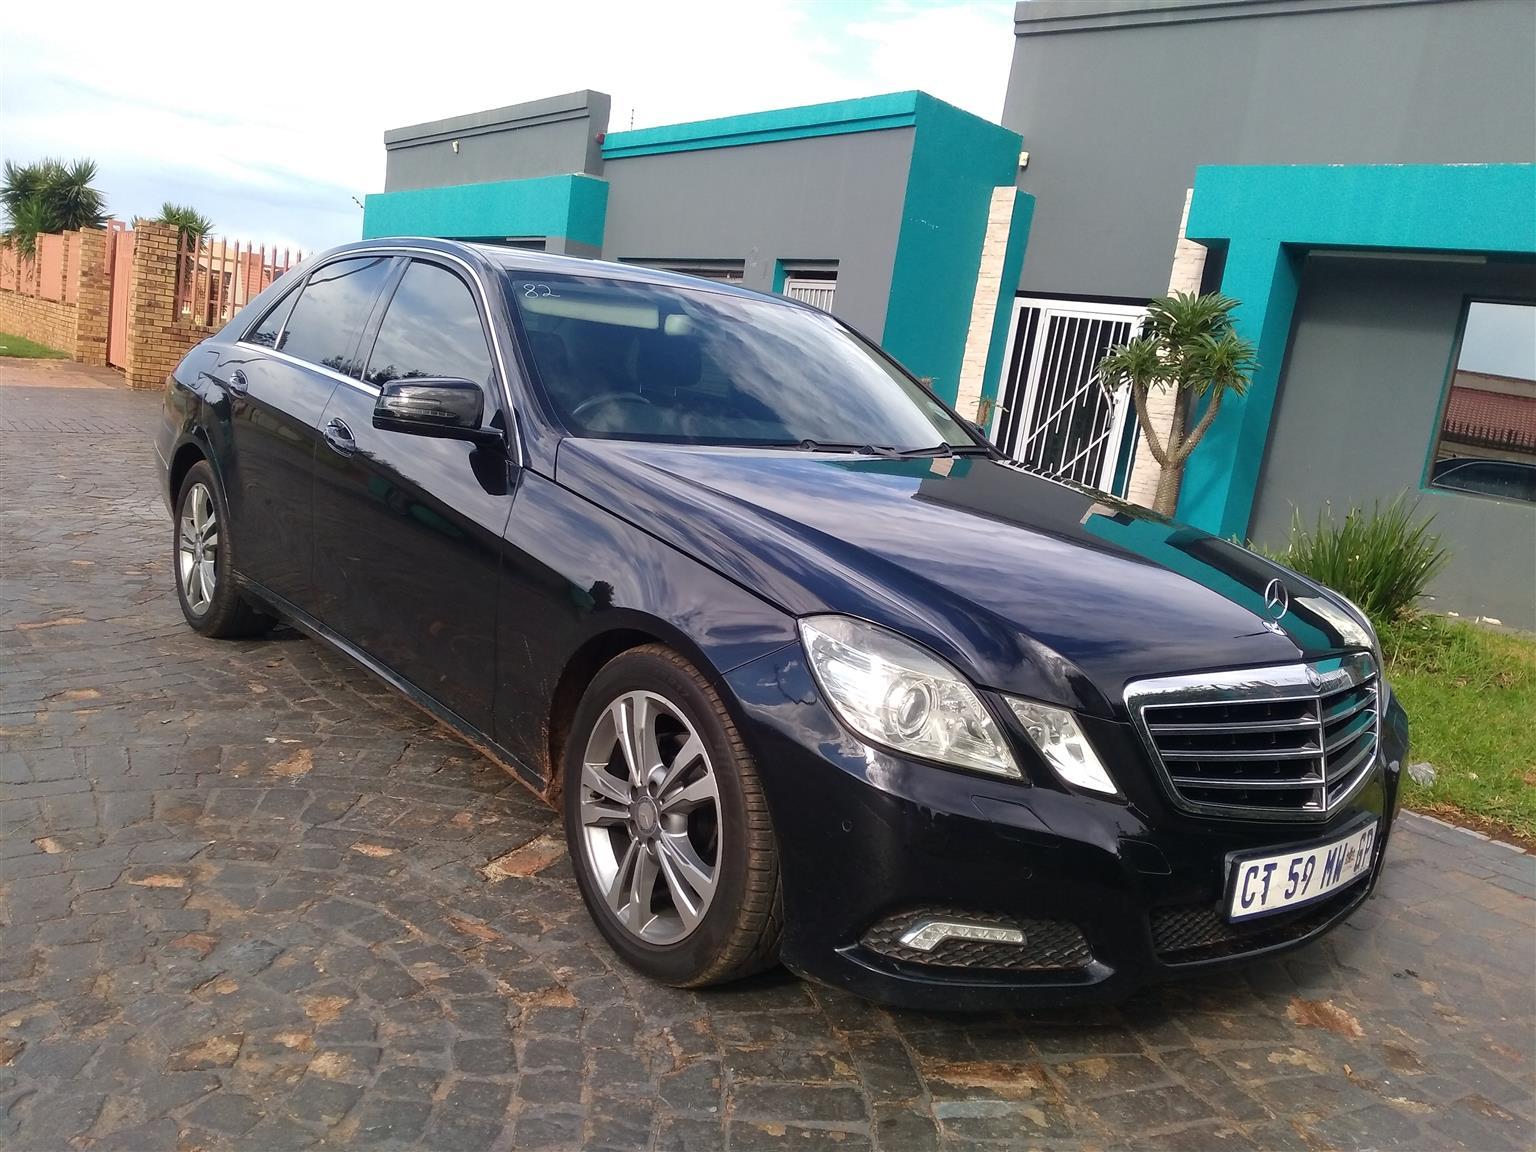 Mercedes-Benz E-Class: Accepting a call